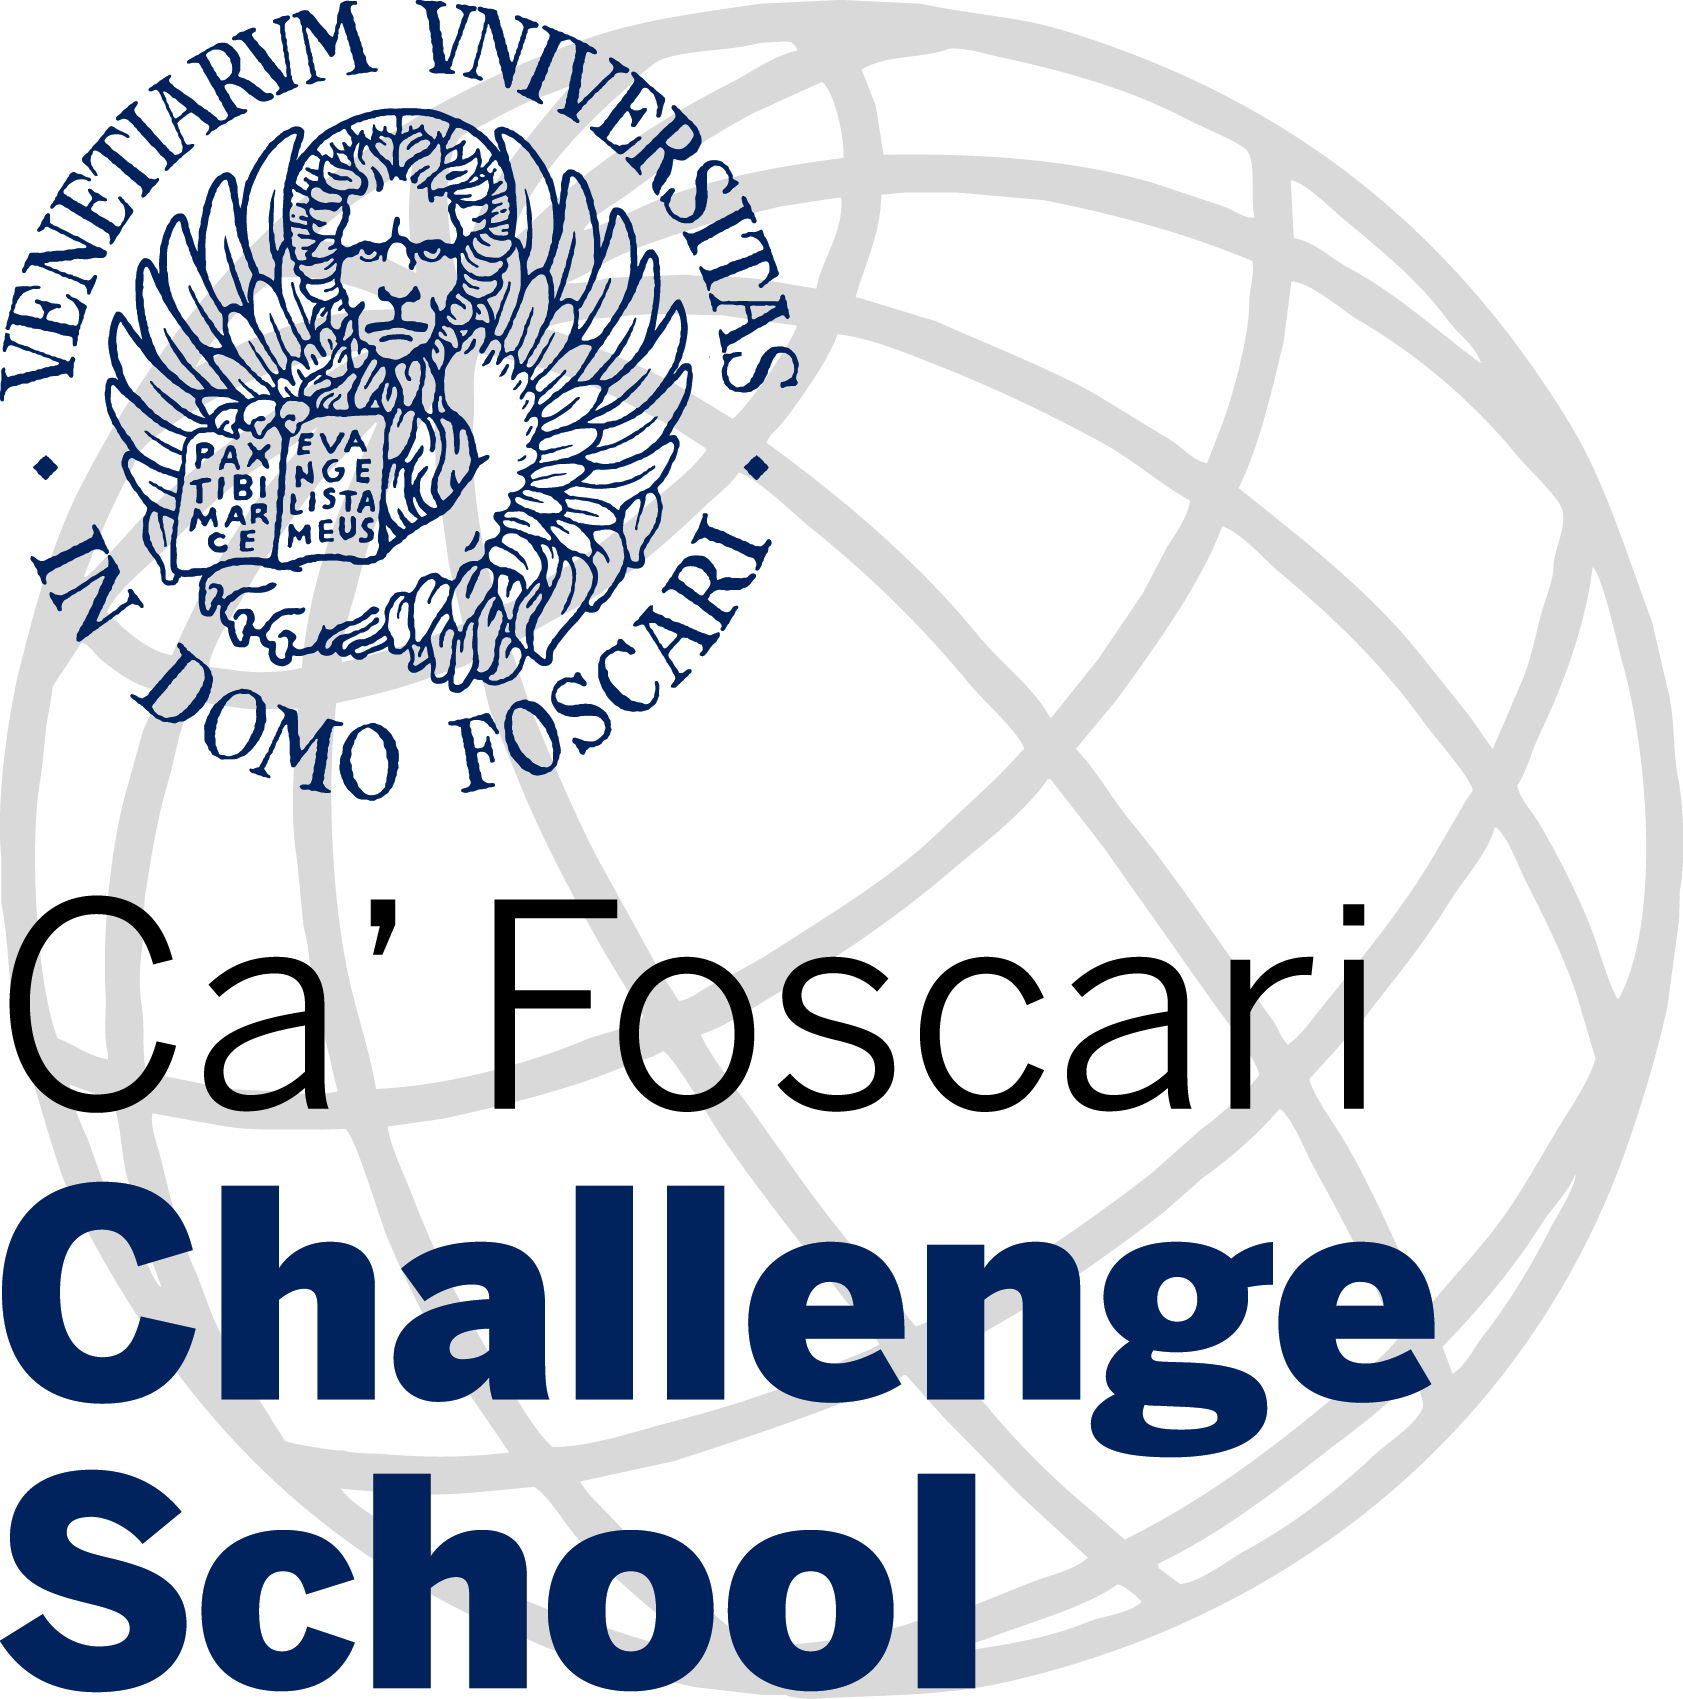 Challenge School Cà Foscari